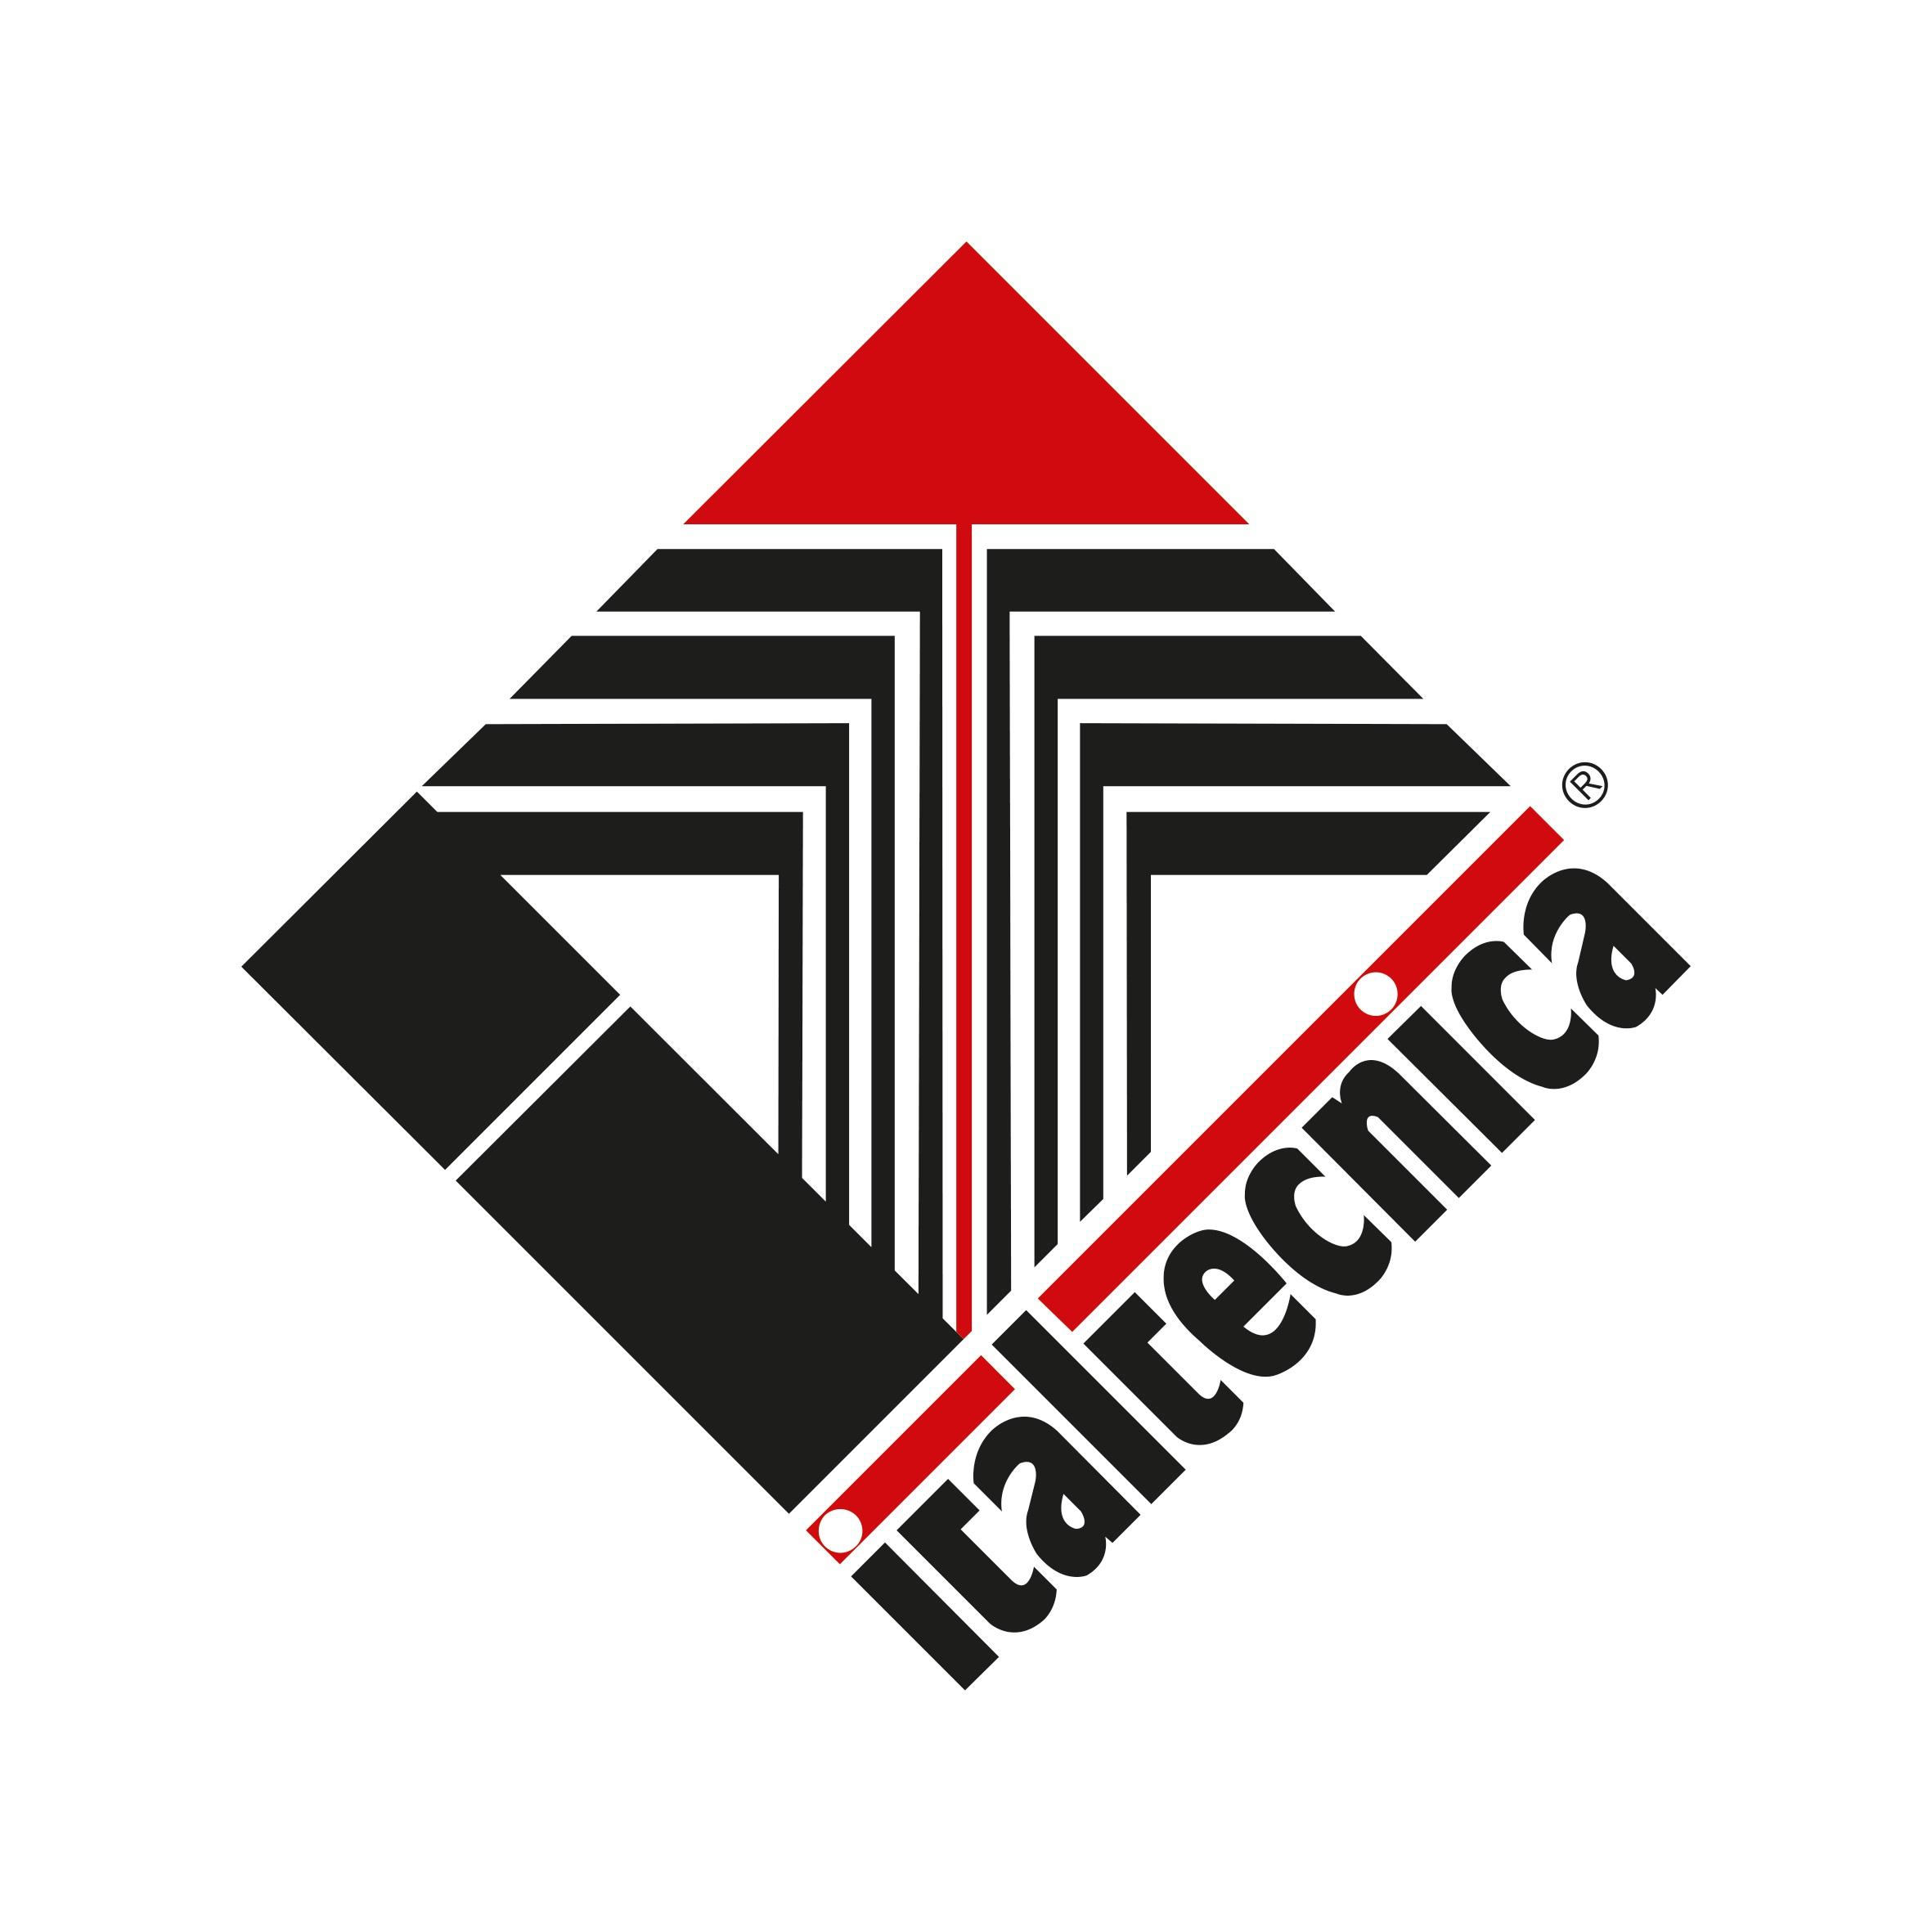 ASIATECNICA (ZHUHAI) ELECTRIC LTD.